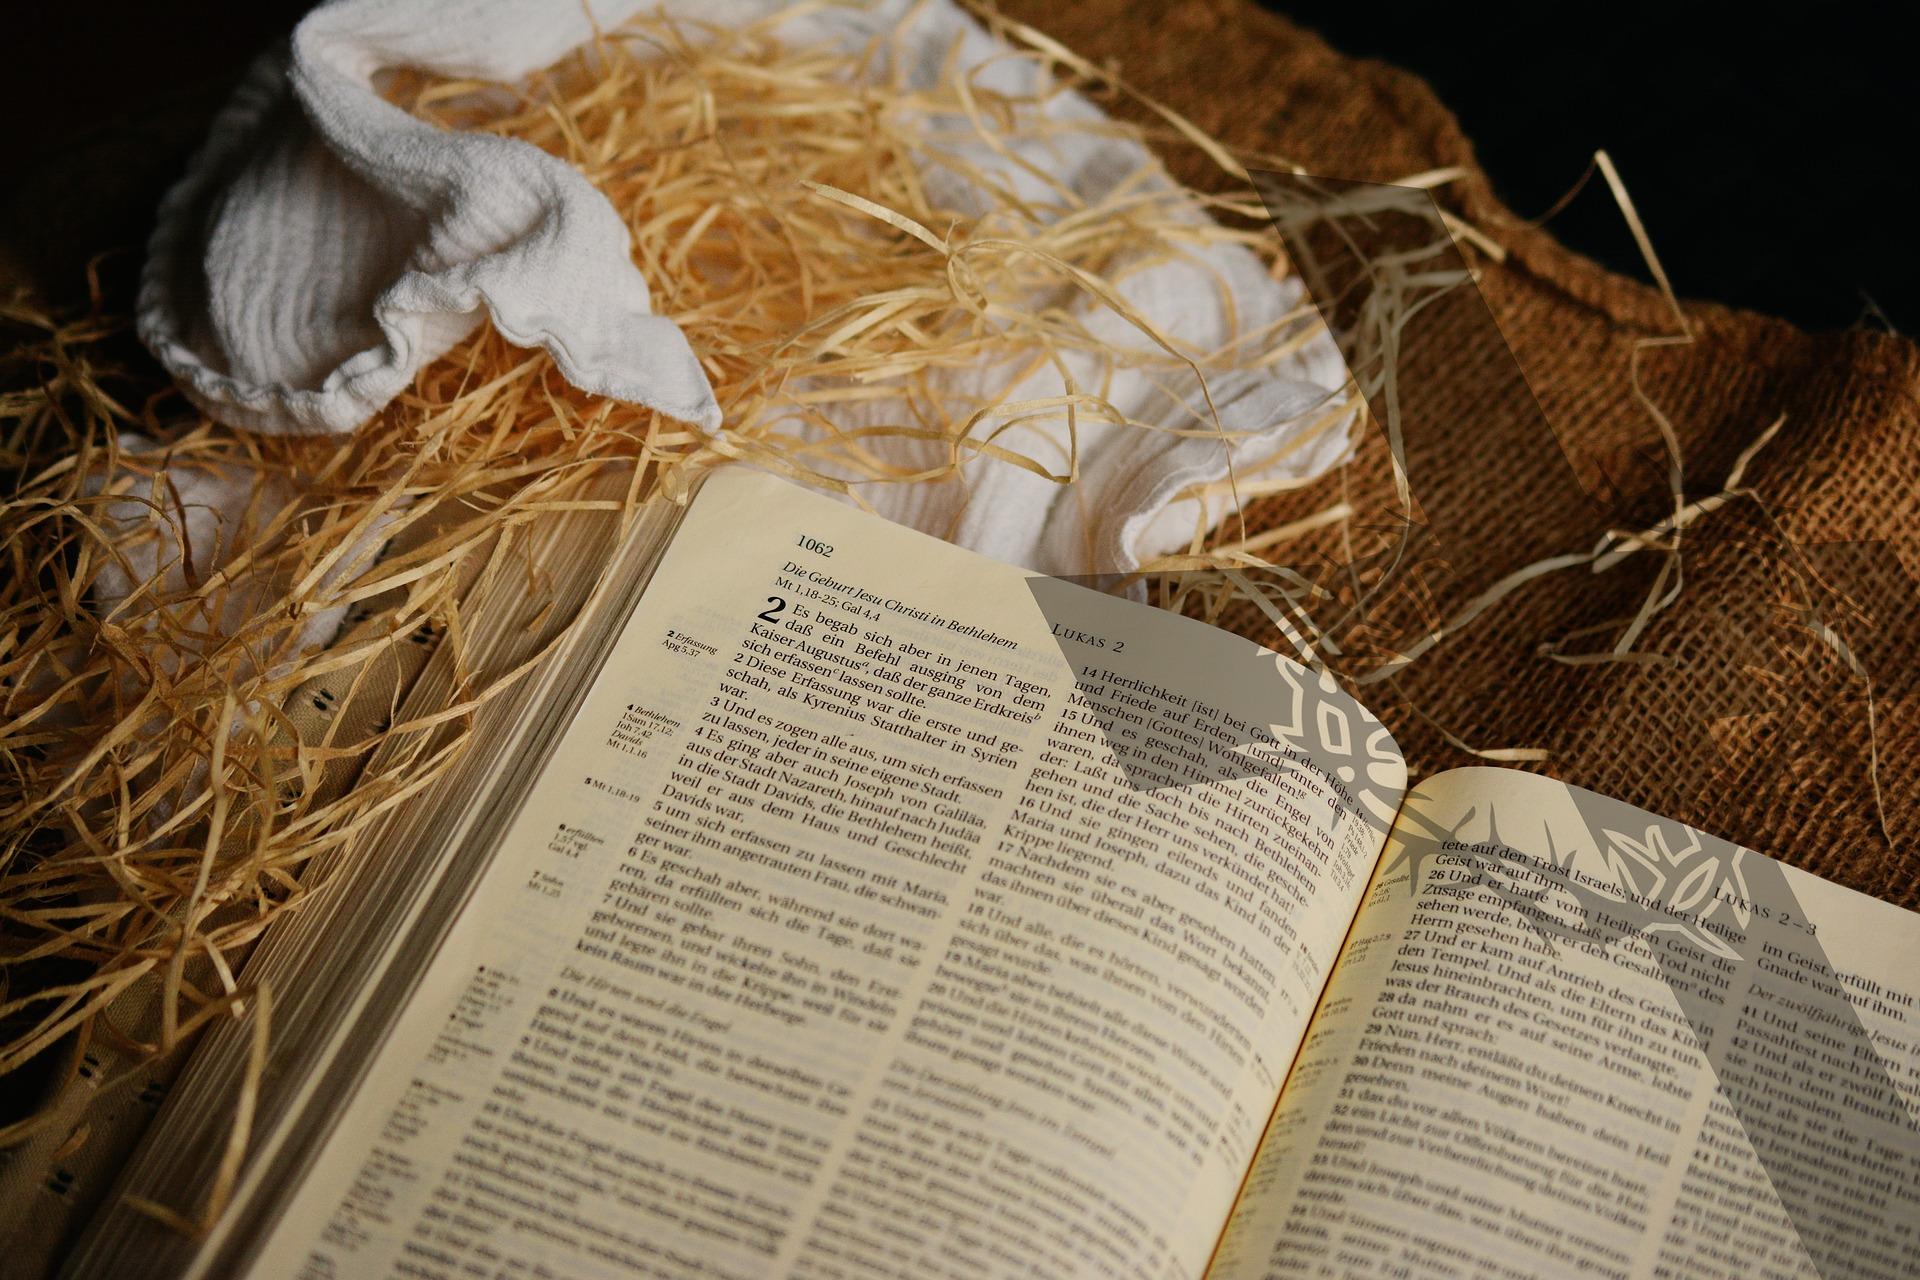 bible-1805790_1920